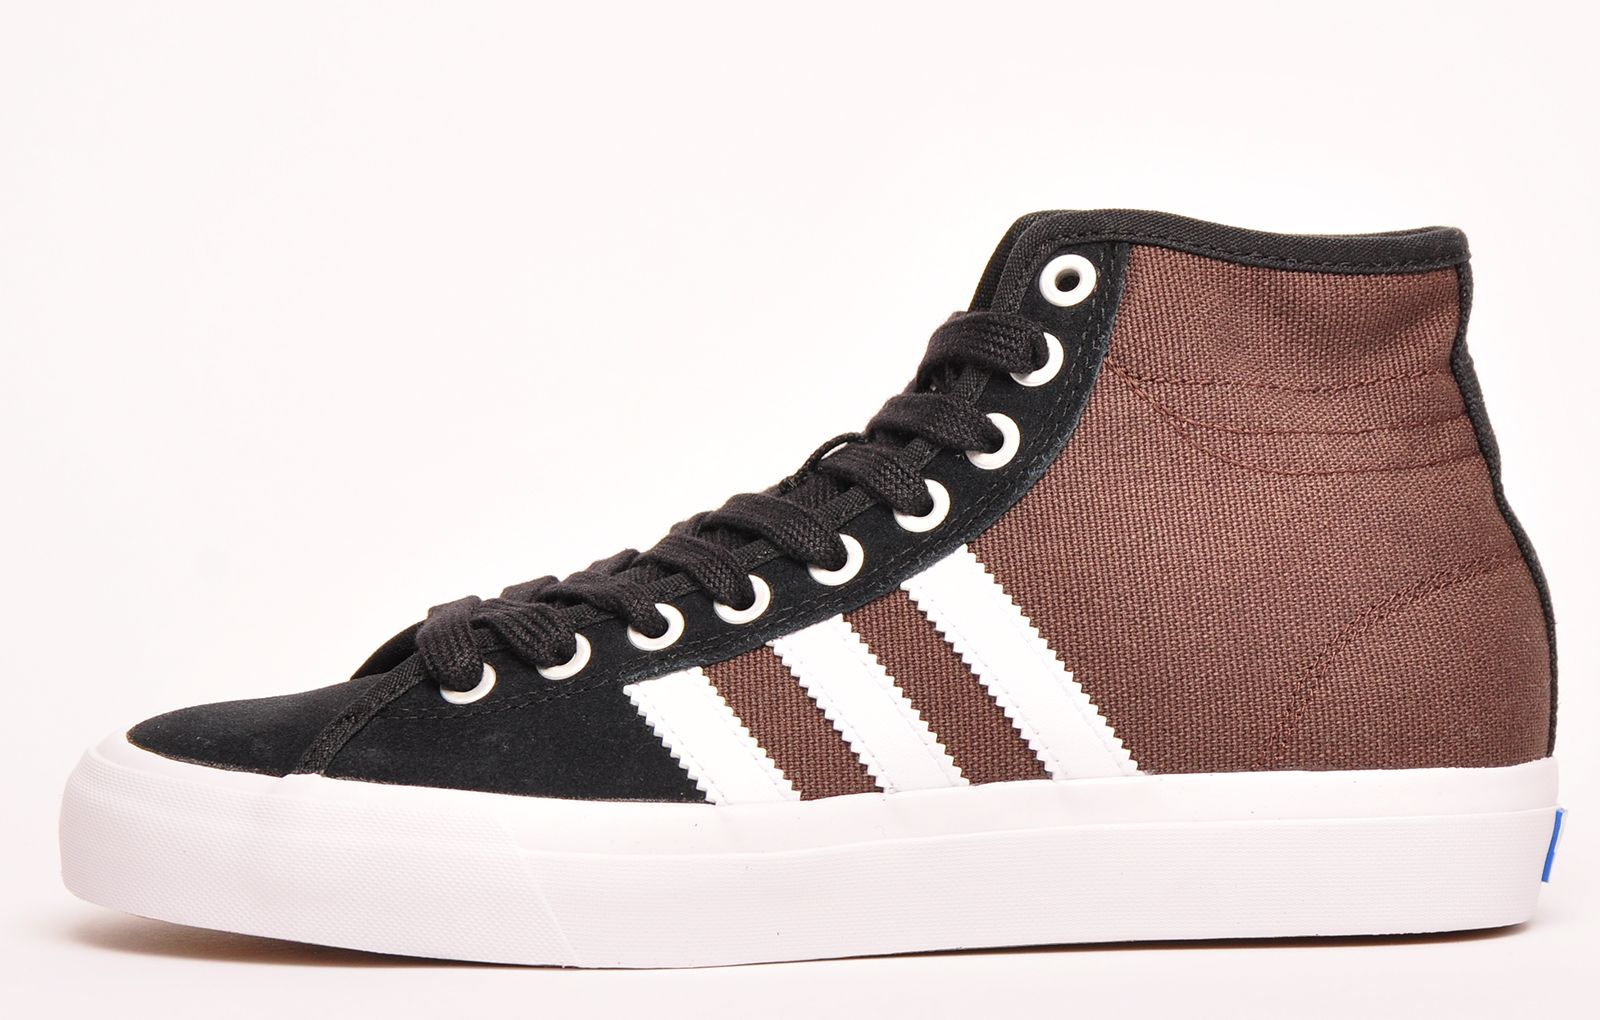 Adidas Originals Matchcourt High RX Mens